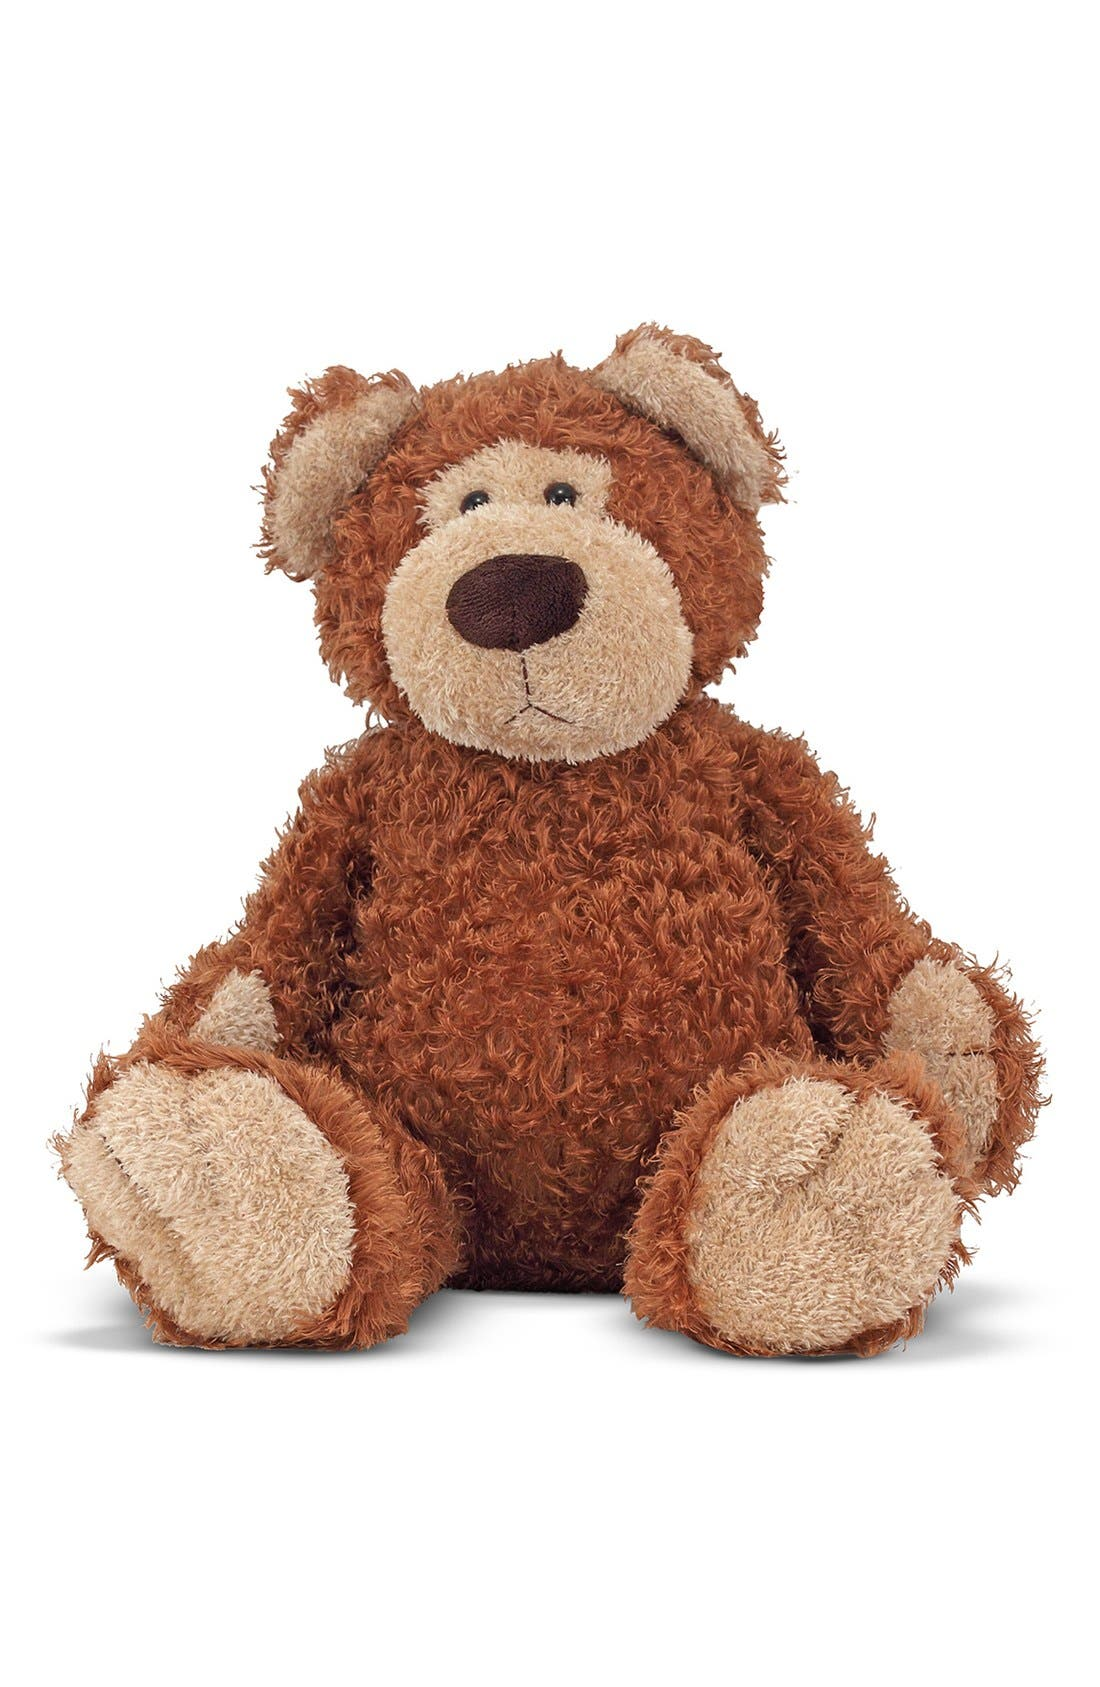 Melissa & Doug 'Big Roscoe' Stuffed Bear